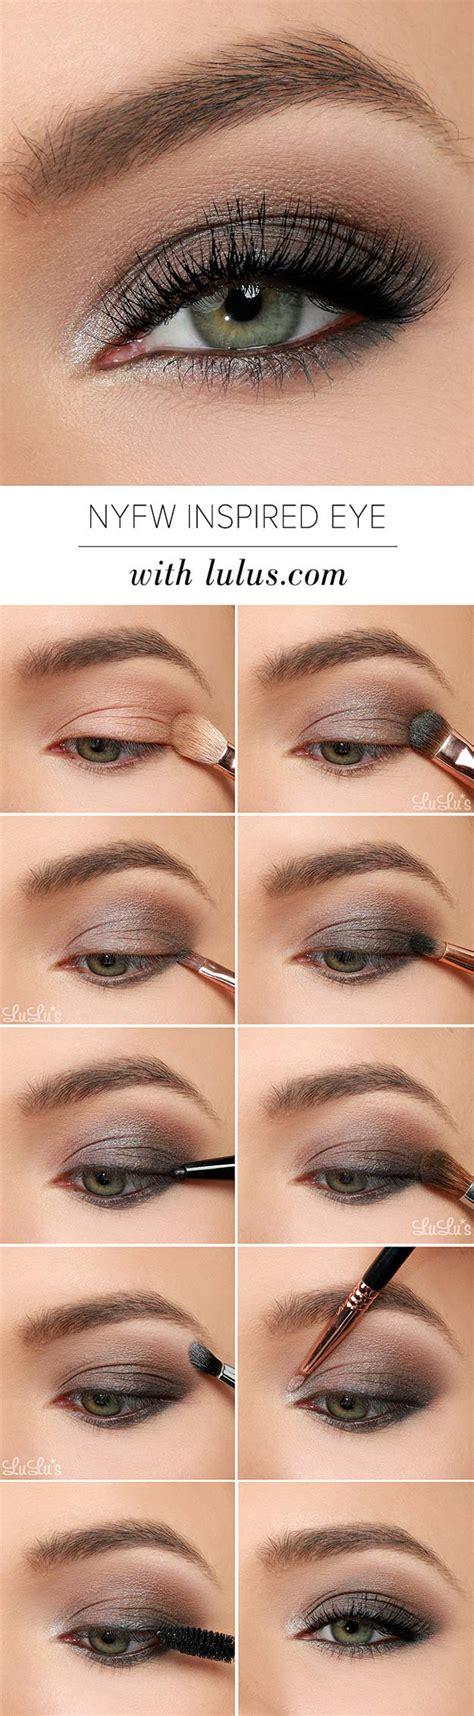 tutorial makeup natural for teenager 25 best eyeshadow tutorials ever created